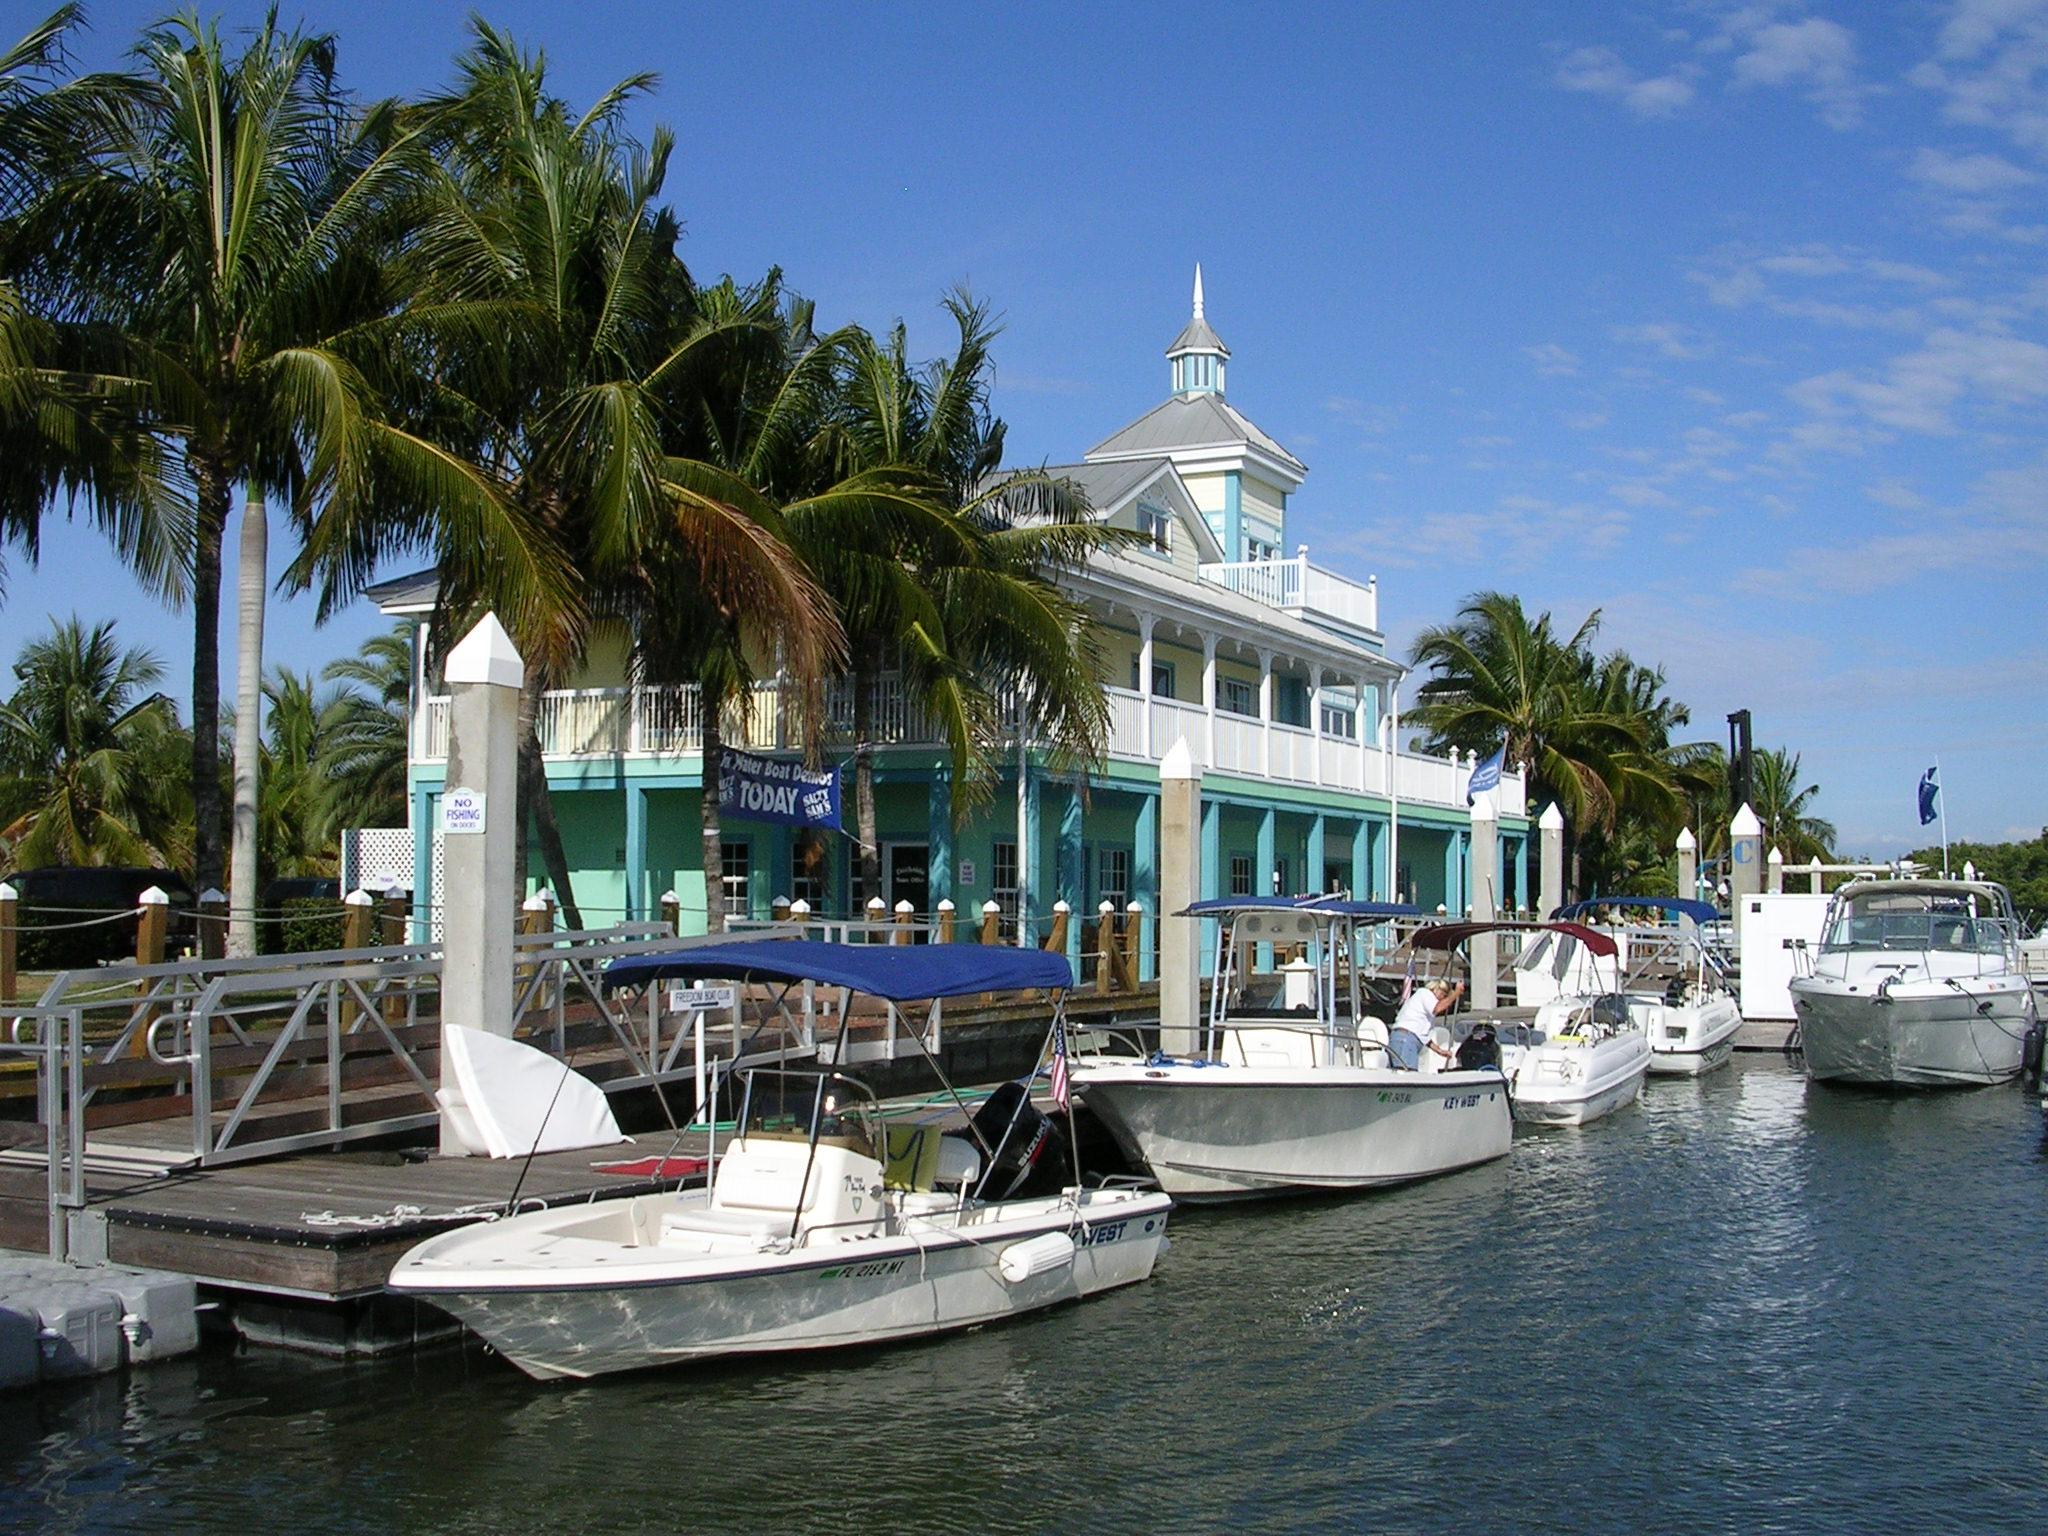 Freedom Boat Club Pensacola Beach